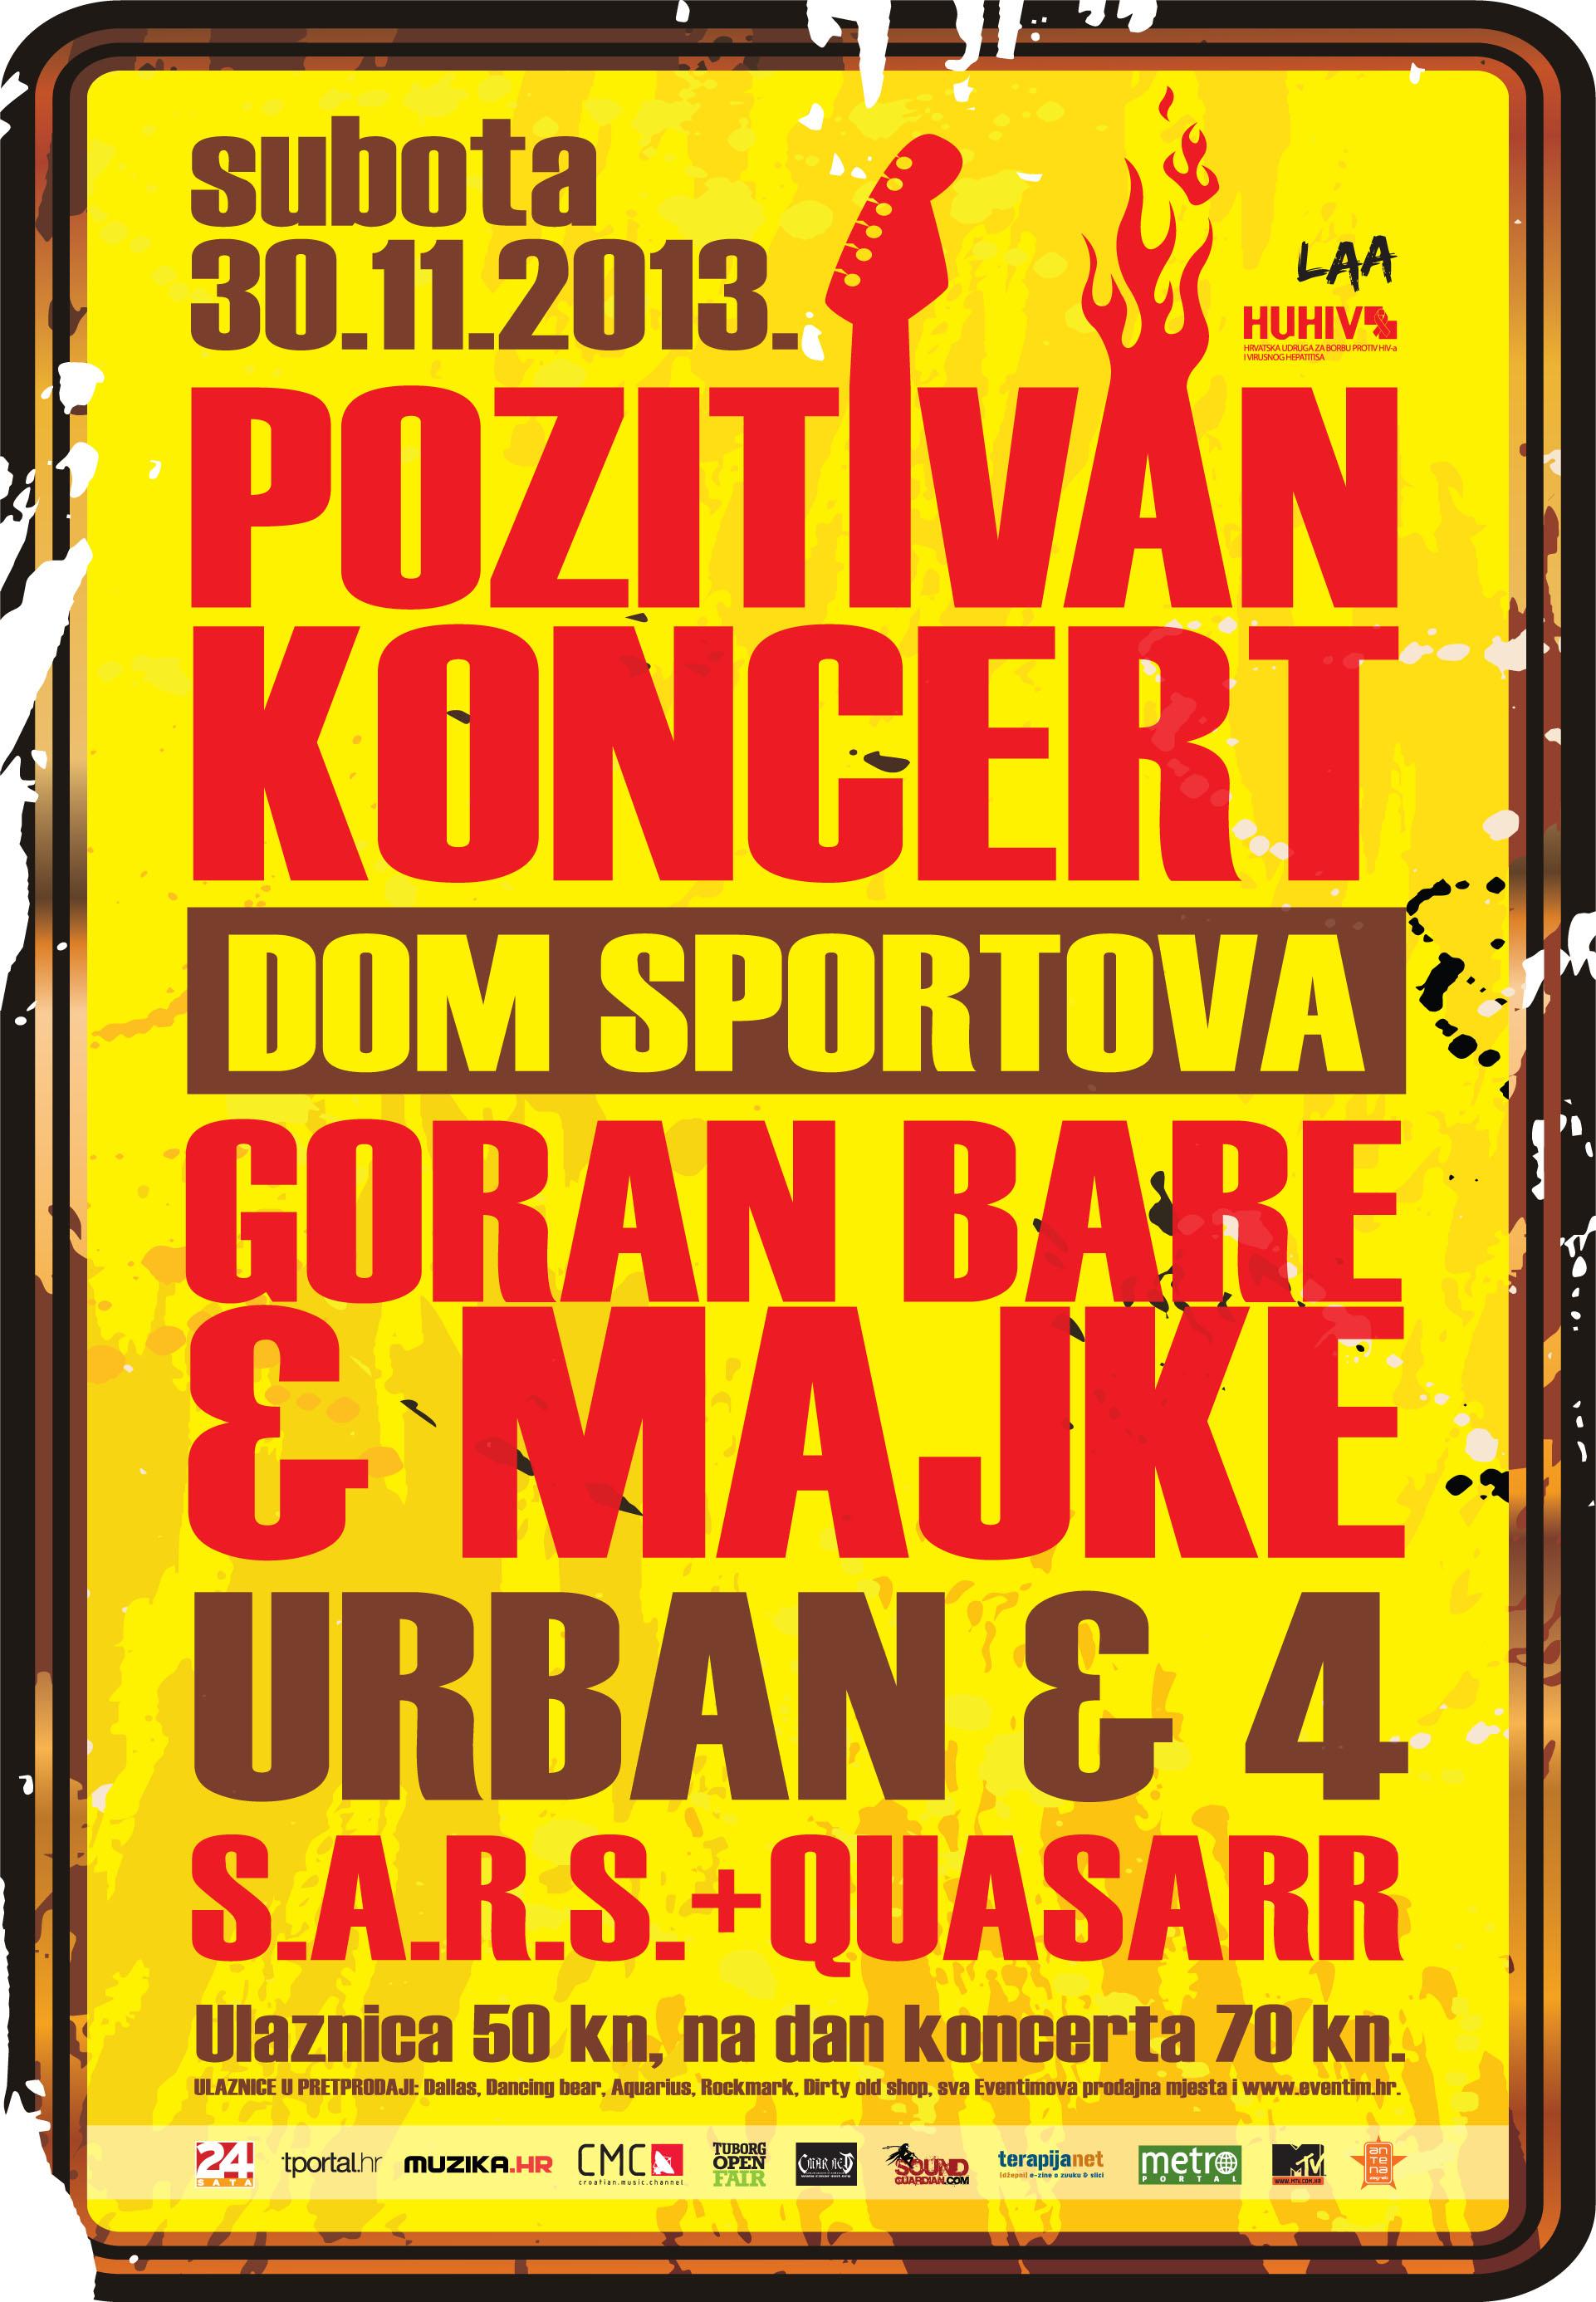 B1_Pozitivan koncert 2013(2)